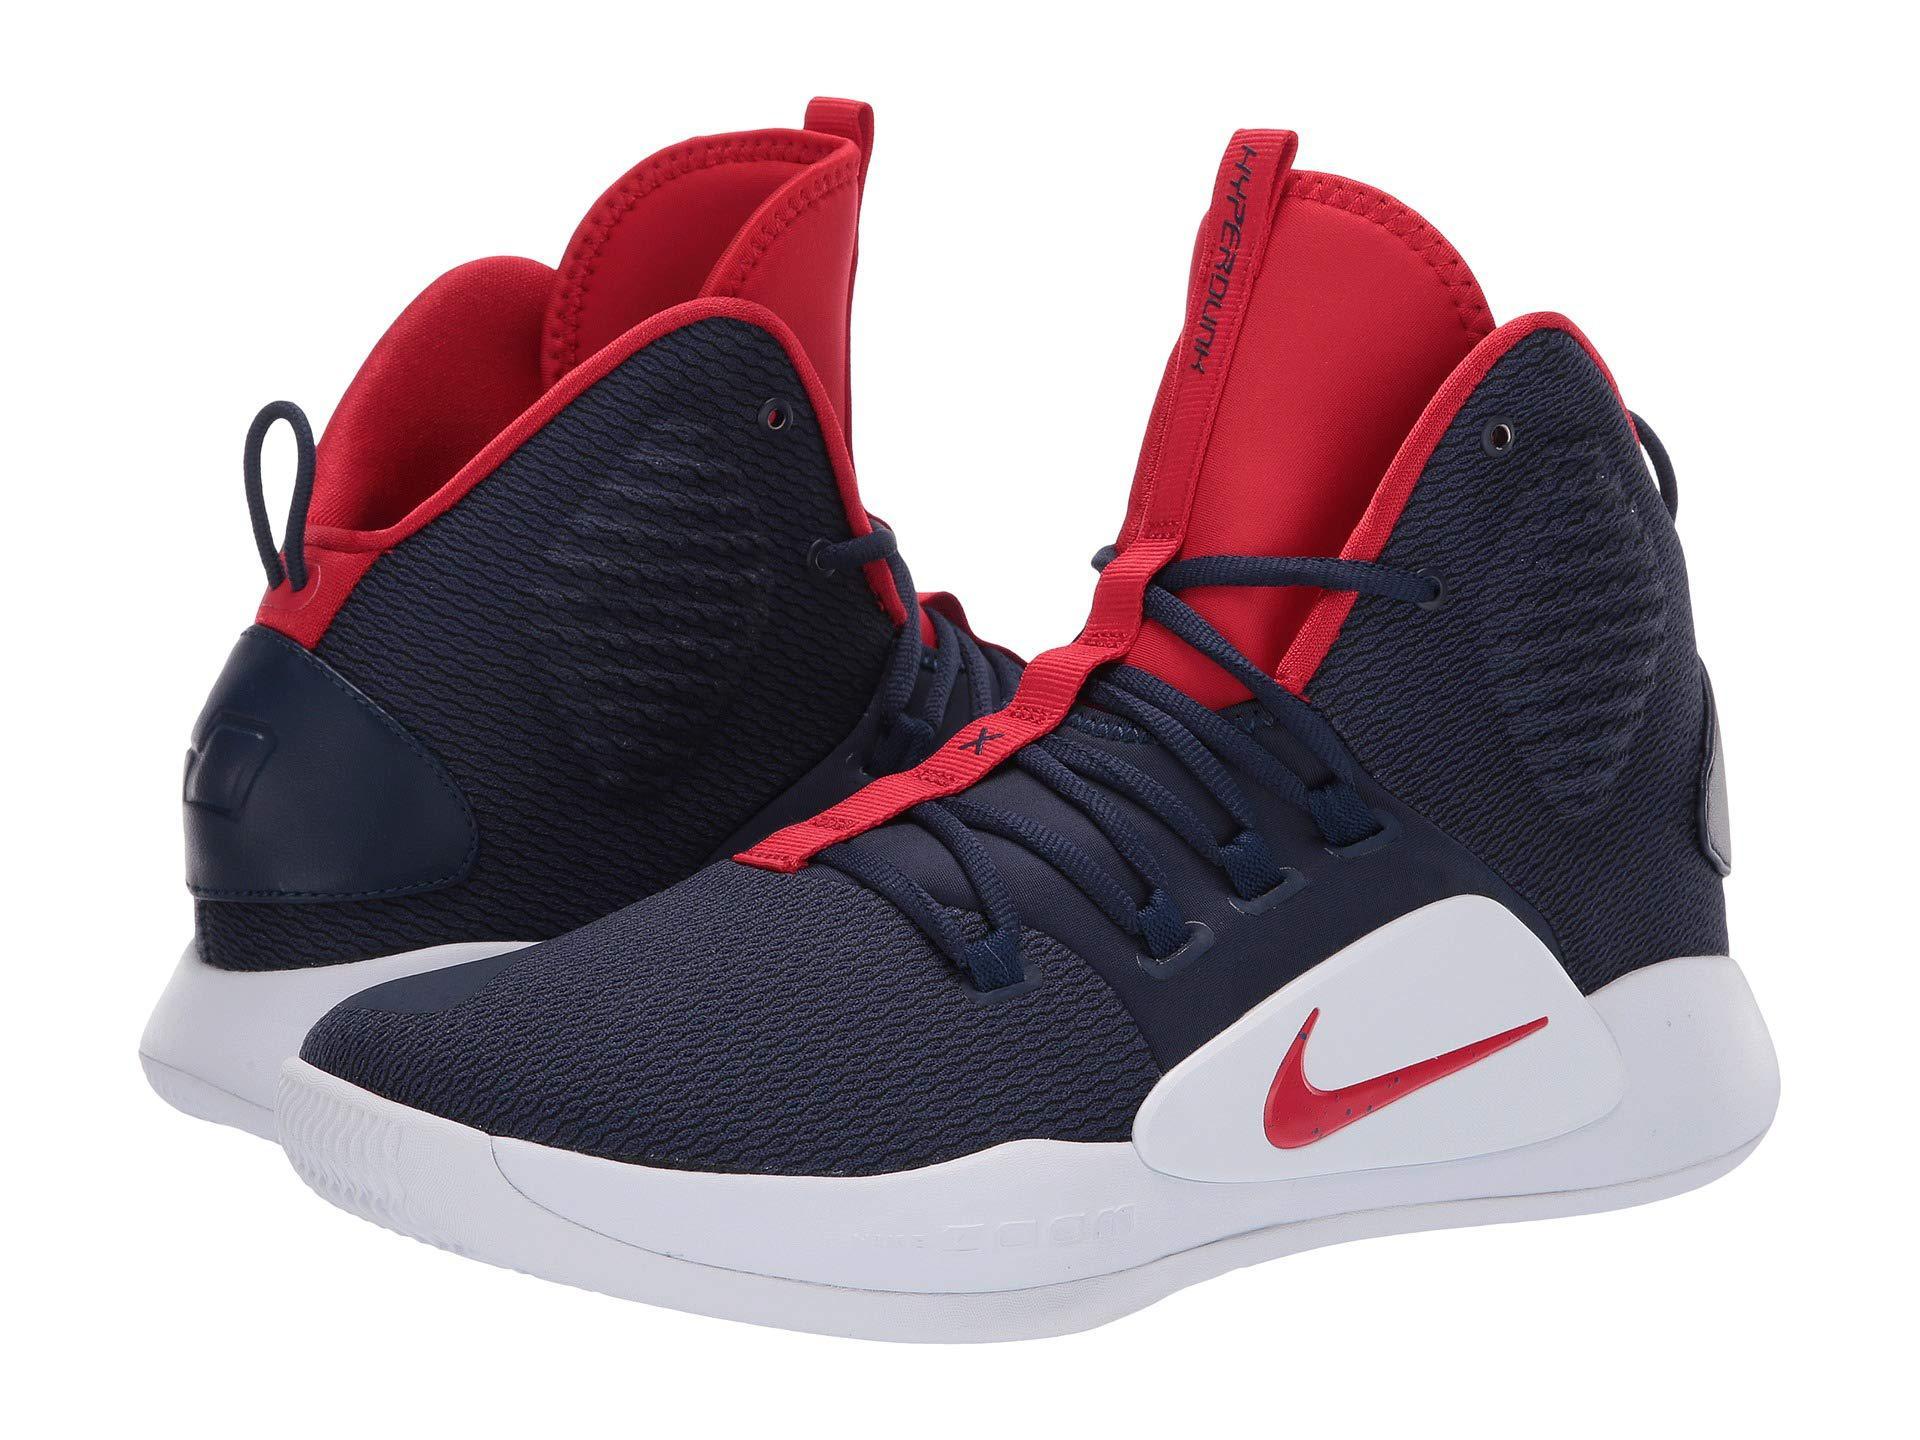 detailed look 451f6 c79c3 Nike Hyperdunk X (midnight Navy university Red white) Men s ...